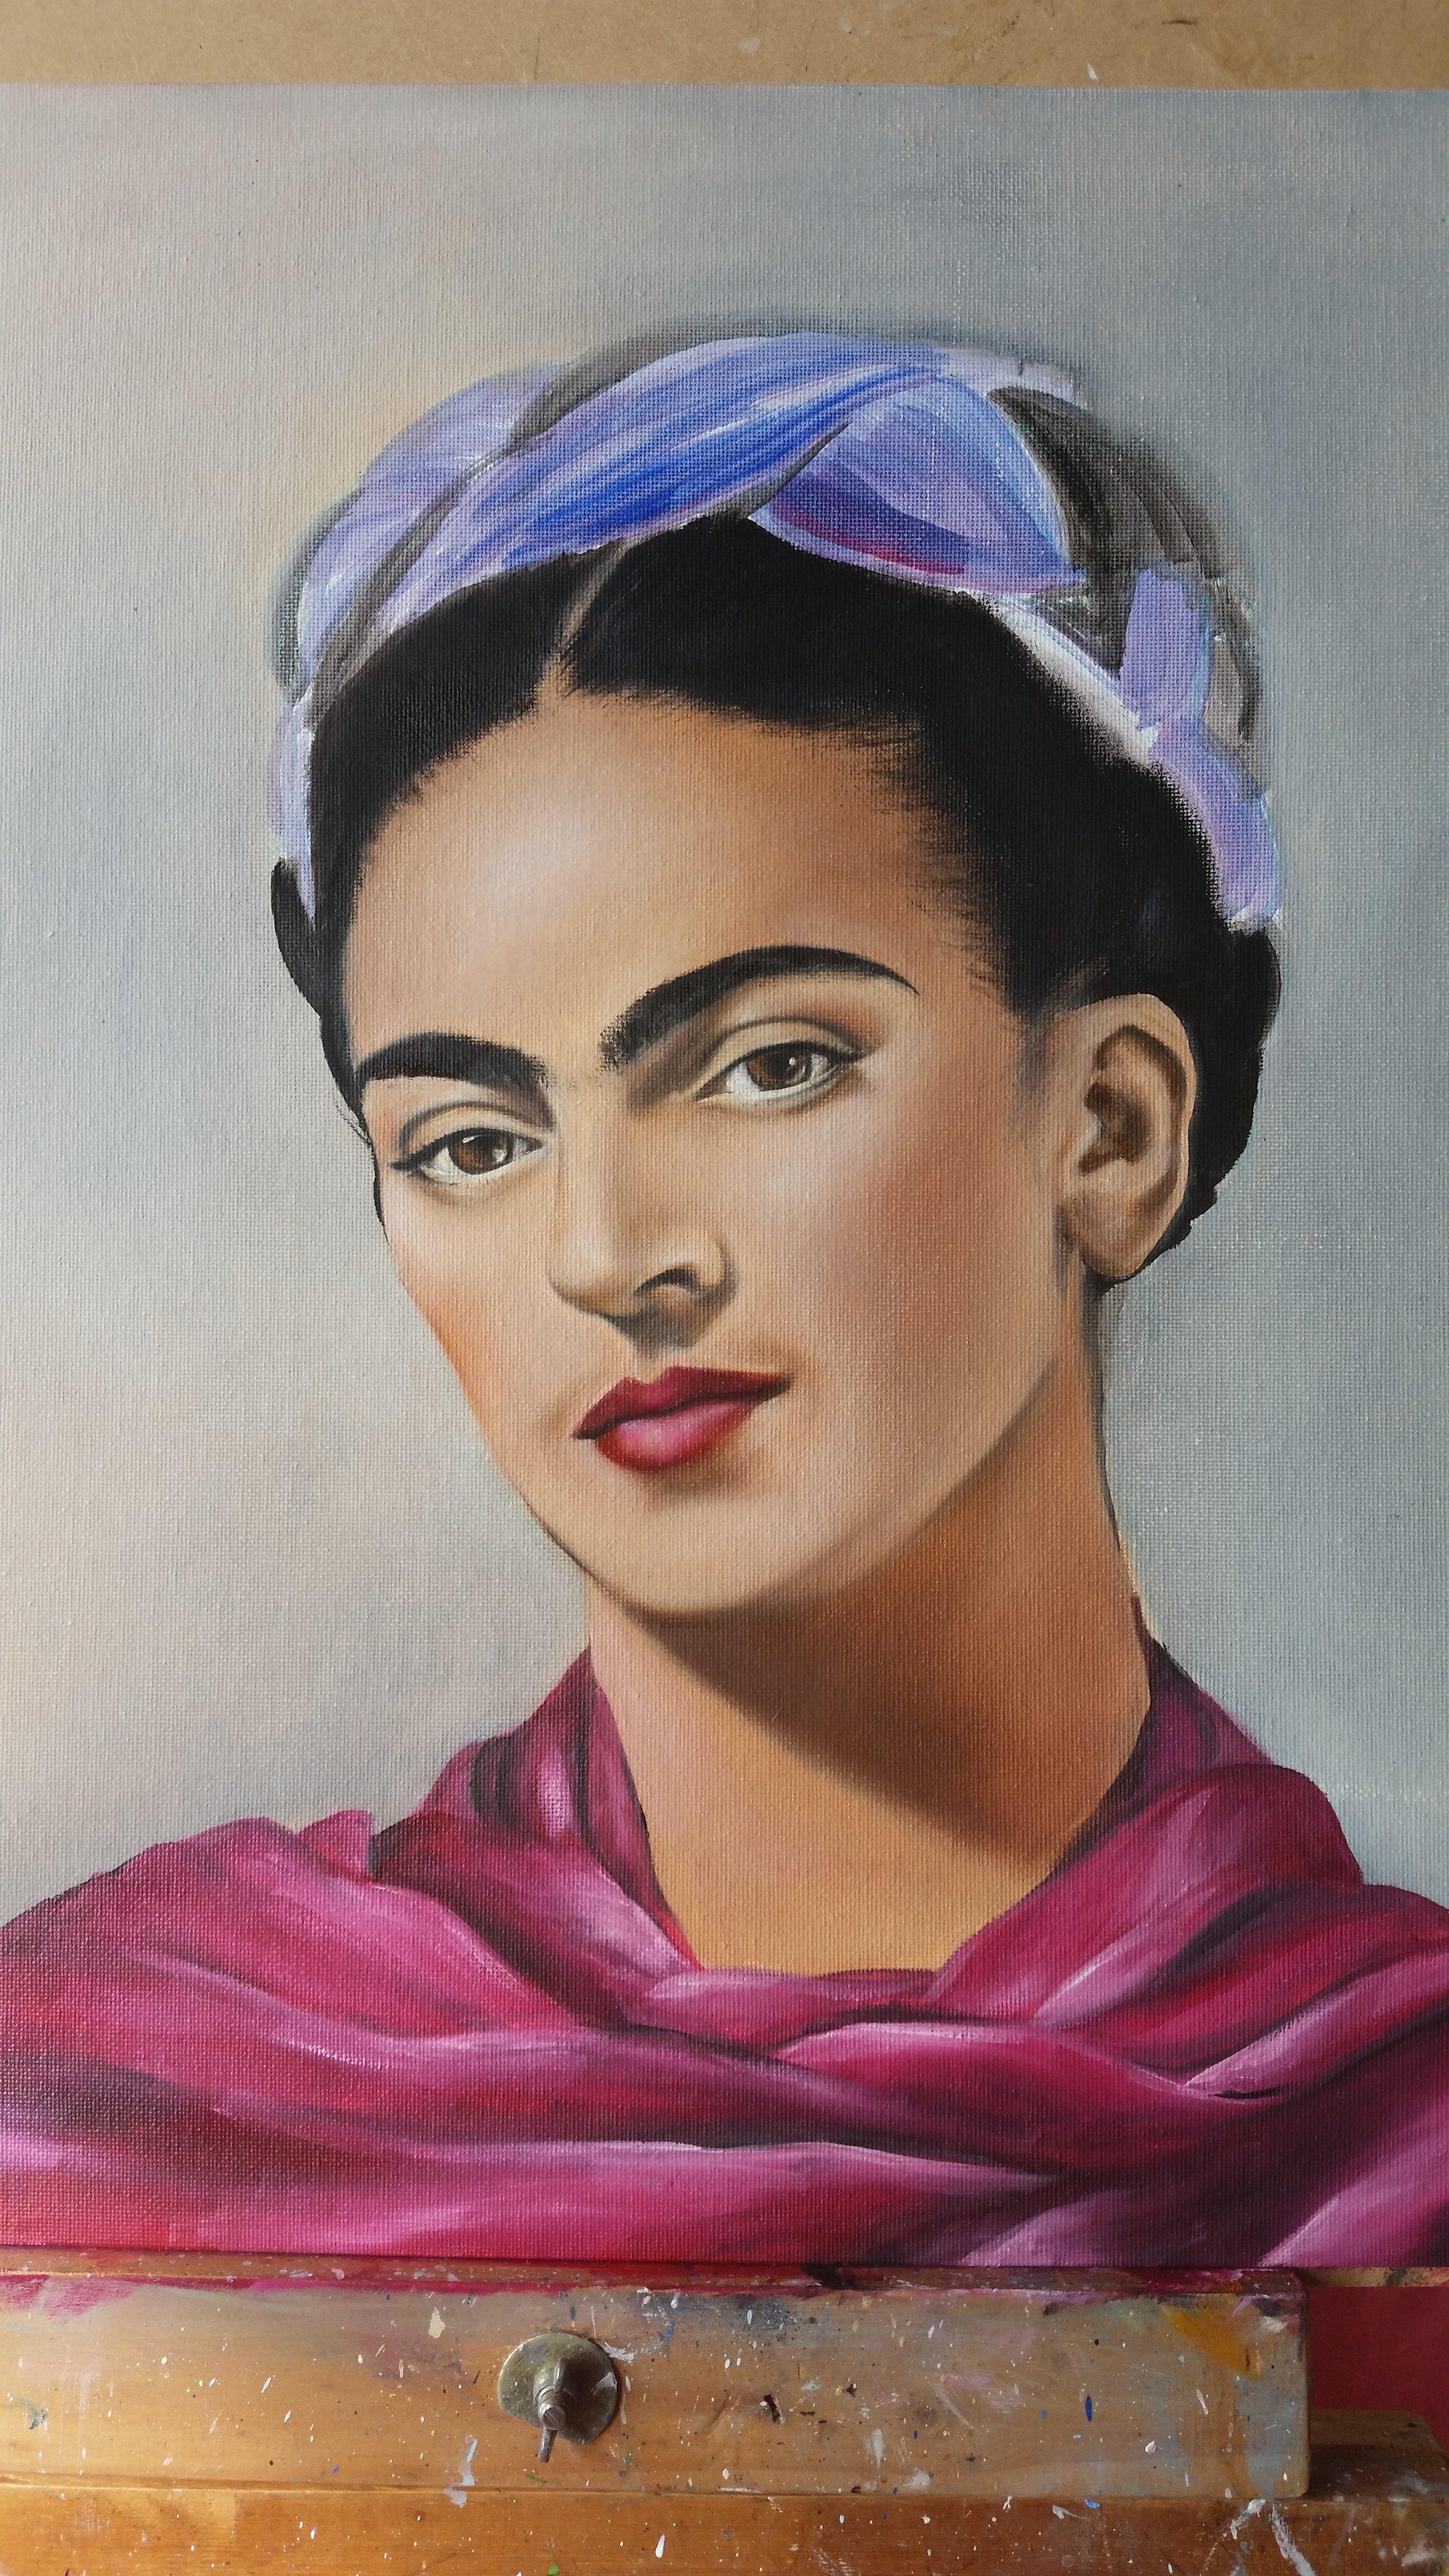 Second layers - Frida Kahlo - Zoe Wood 2017